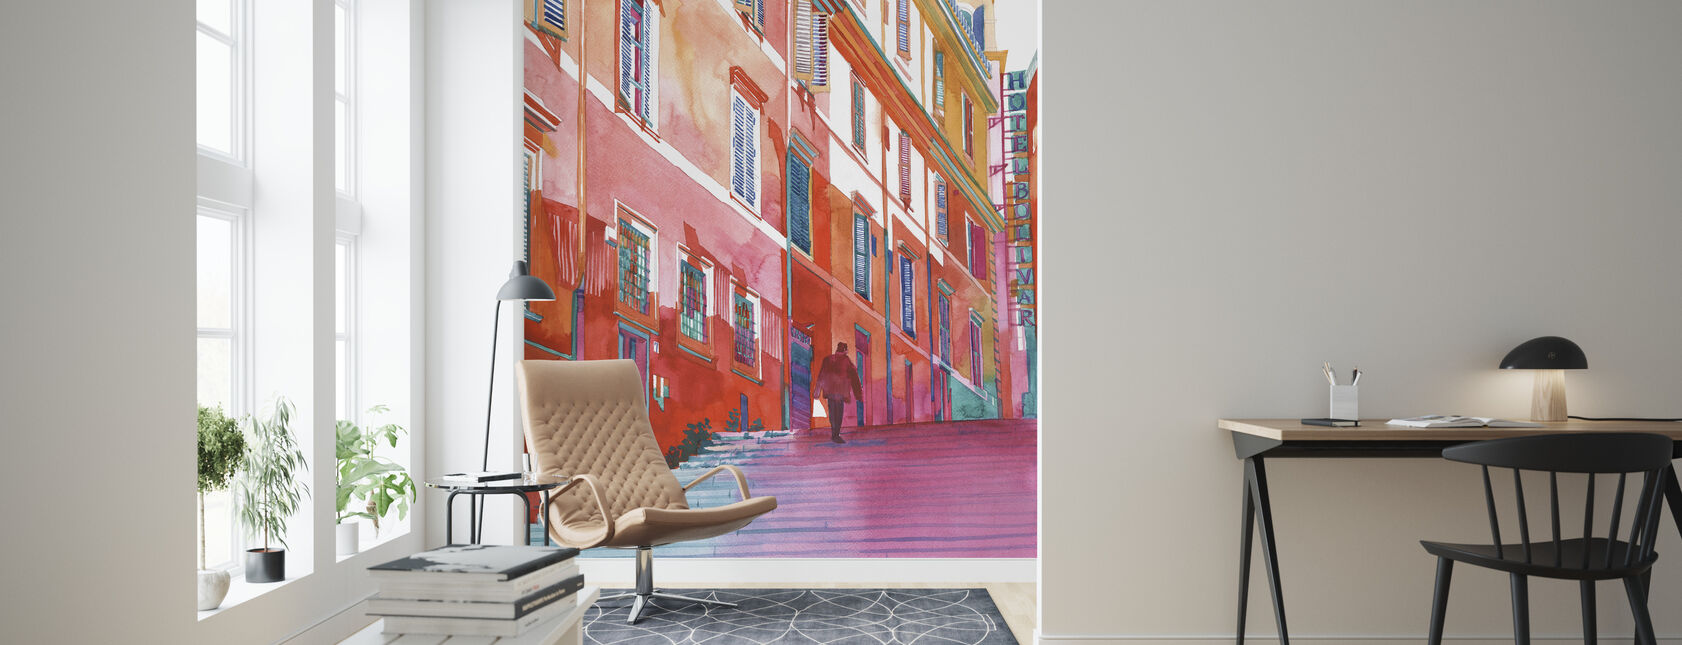 Hotel in Rome - Wallpaper - Living Room